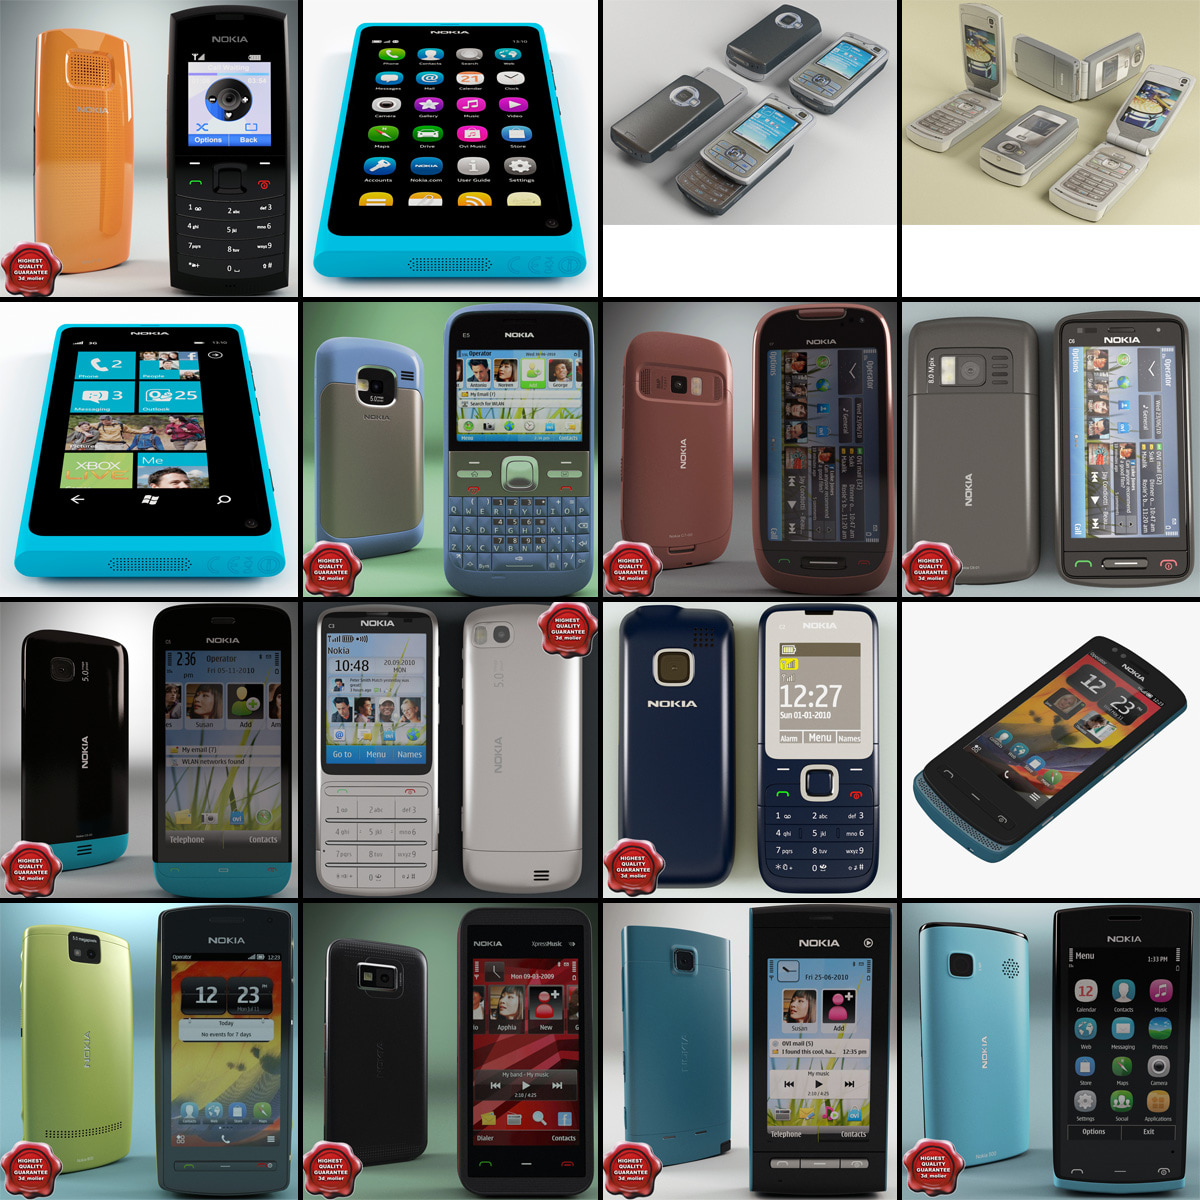 Nokia_Phones_Collection_V6_000.jpg